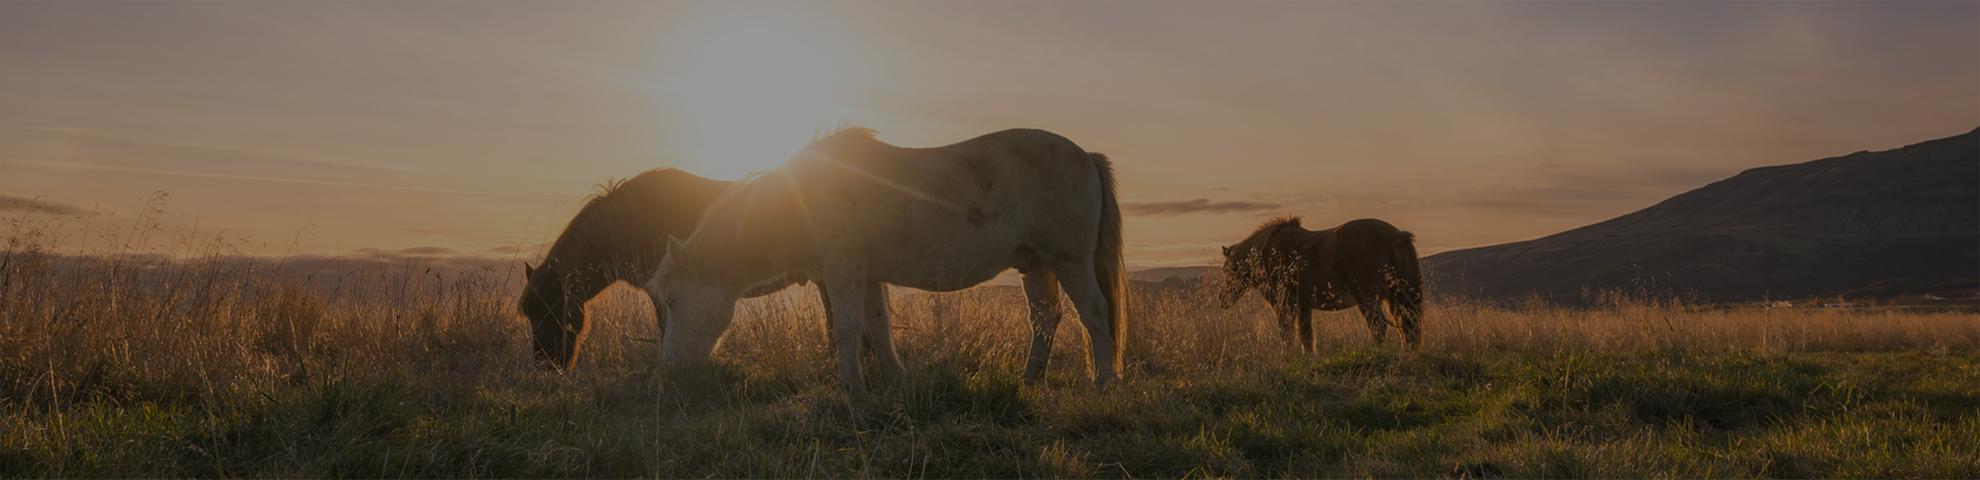 cheval en liberte